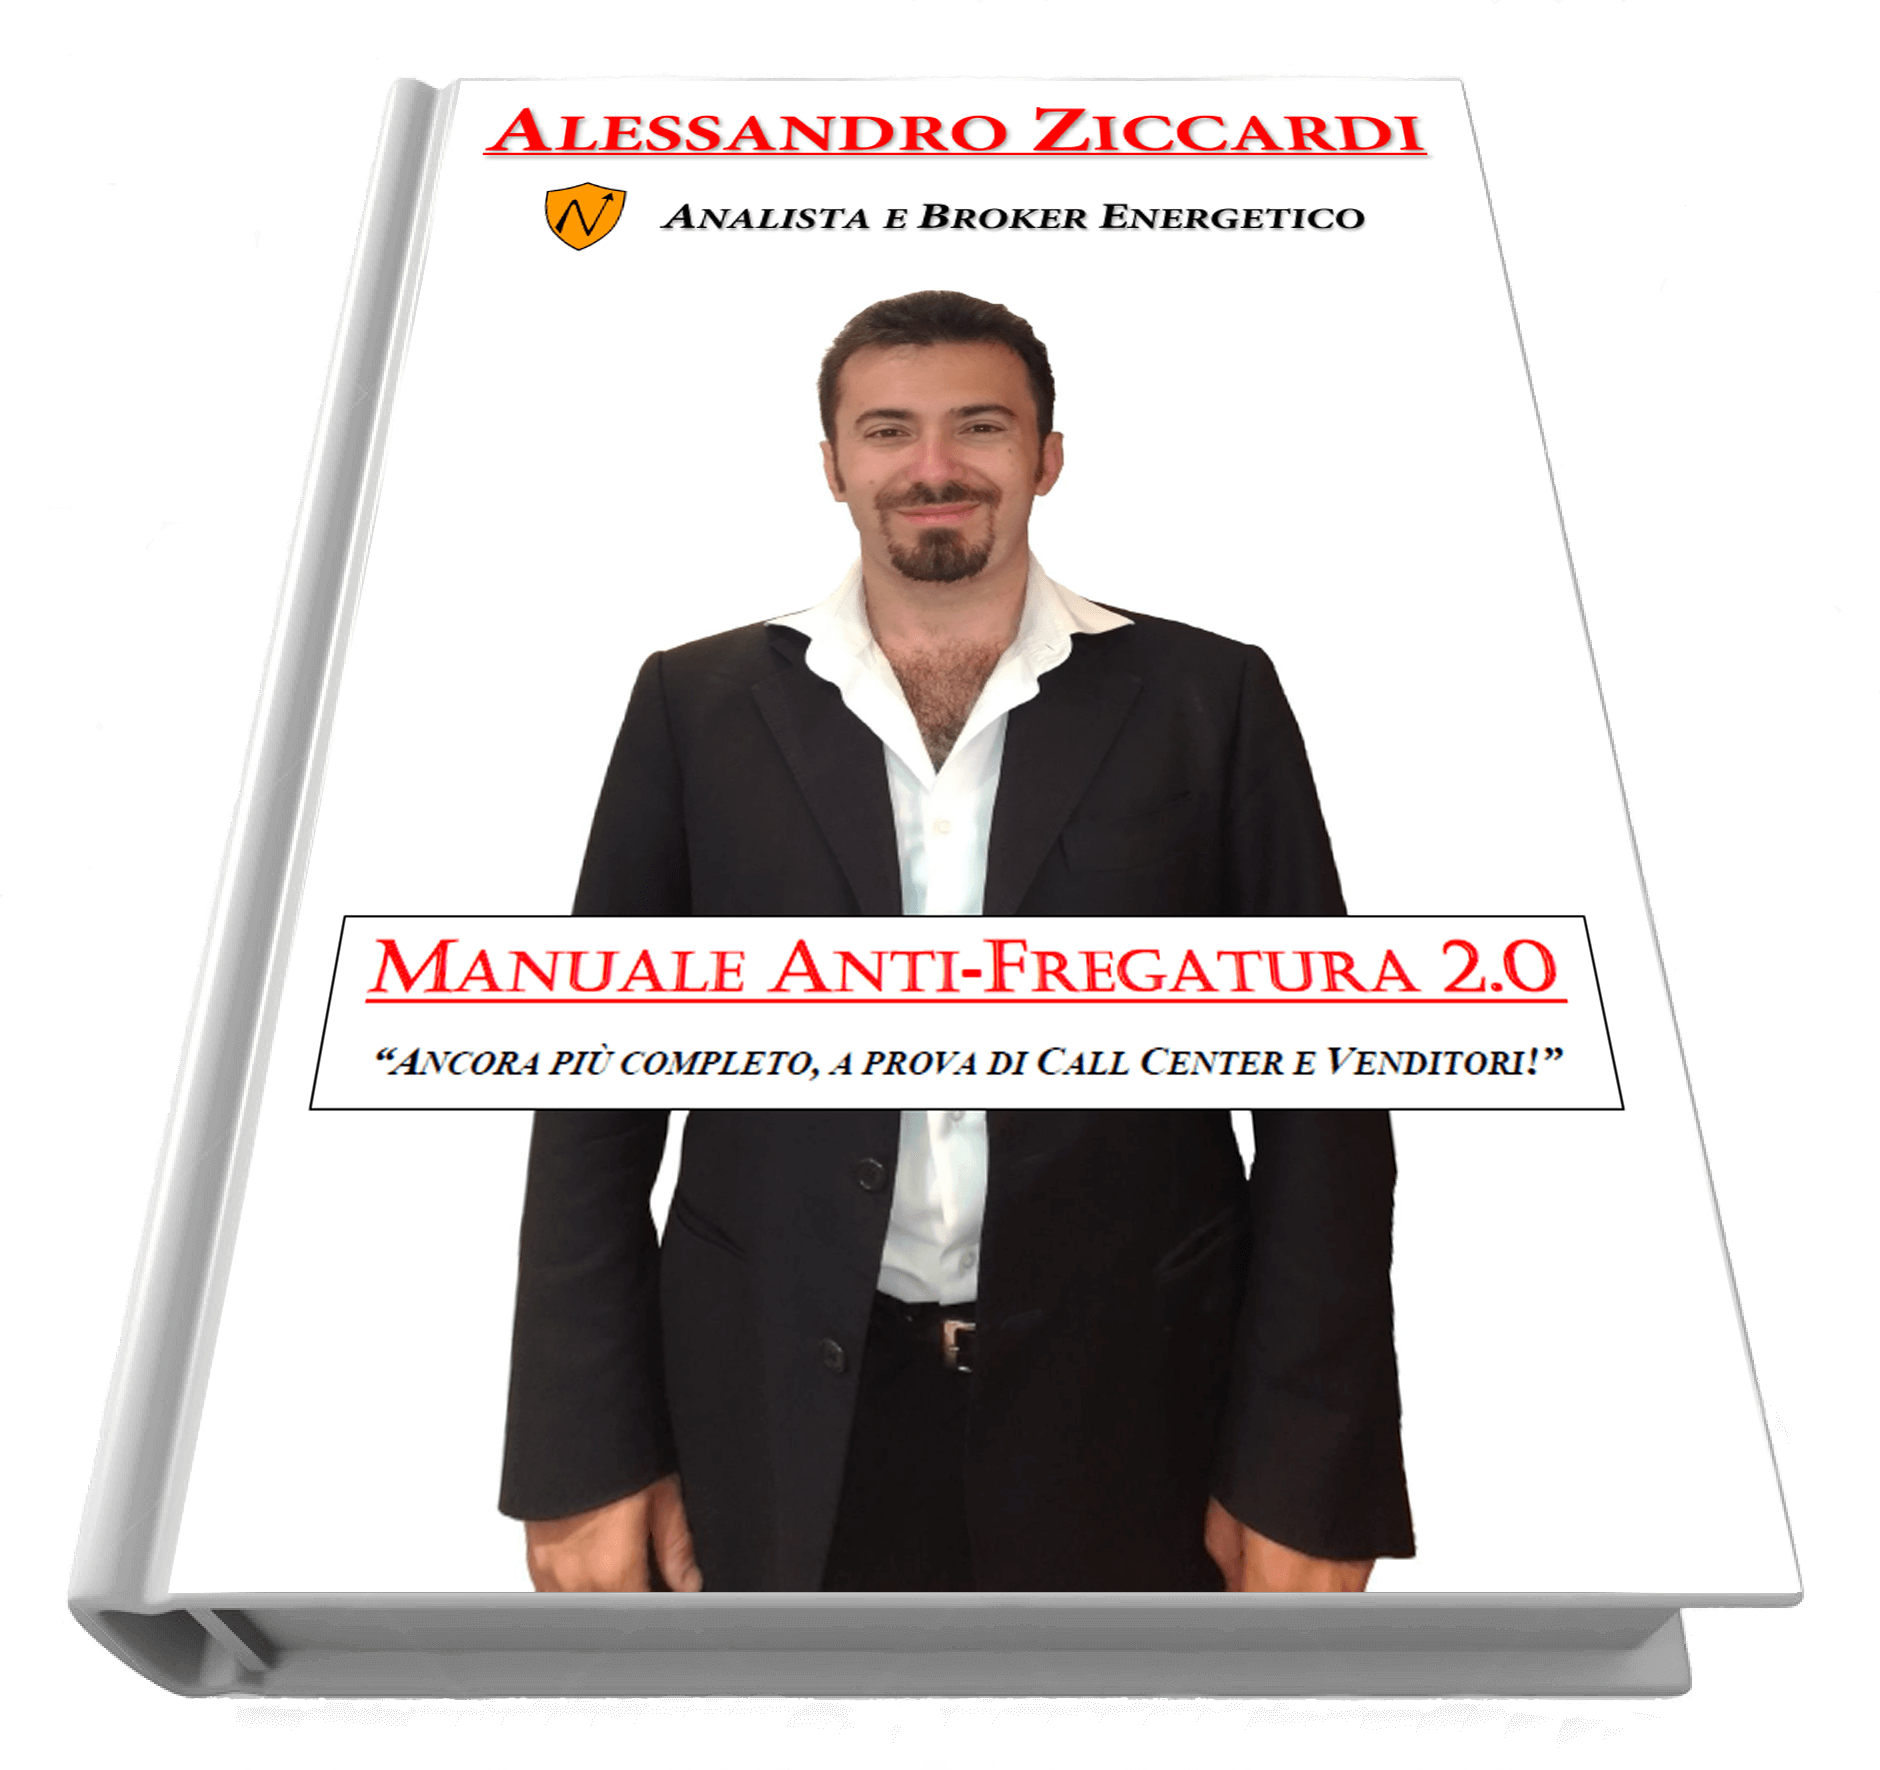 Manuale Anti-Fregatura 2.0 ridotto